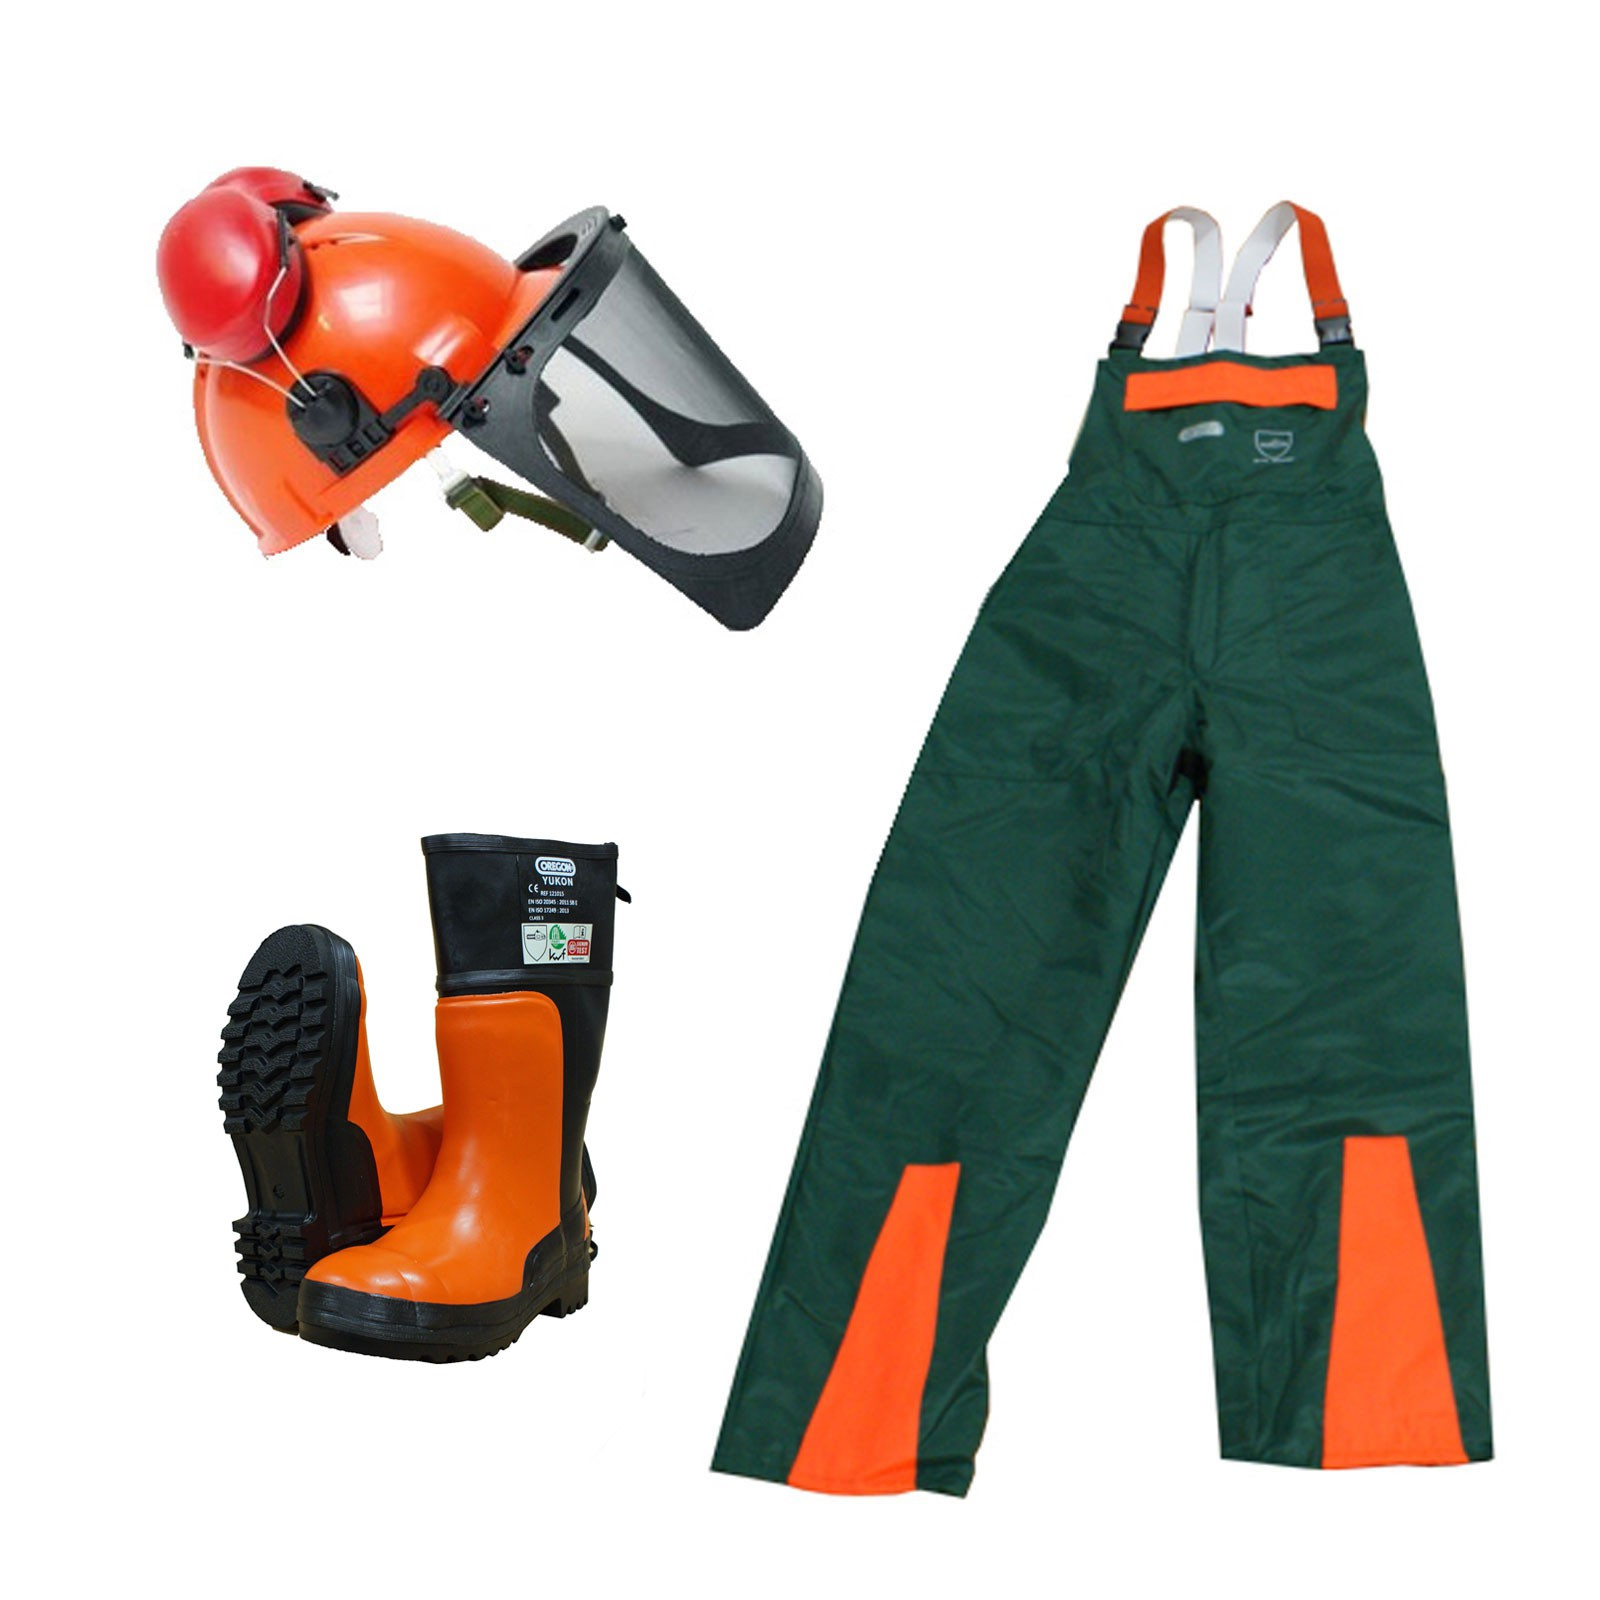 Marken Forst Schnittschutz 3er Set  Helm + KWF-Hose + KWF-Stiefel, Waldarbeit, Forstarbeit, Brennholzaufbereitung, Kettensägen-Schutz, Motorsägen-Lehrgang, Persönliche Schutzausrüstung, ,